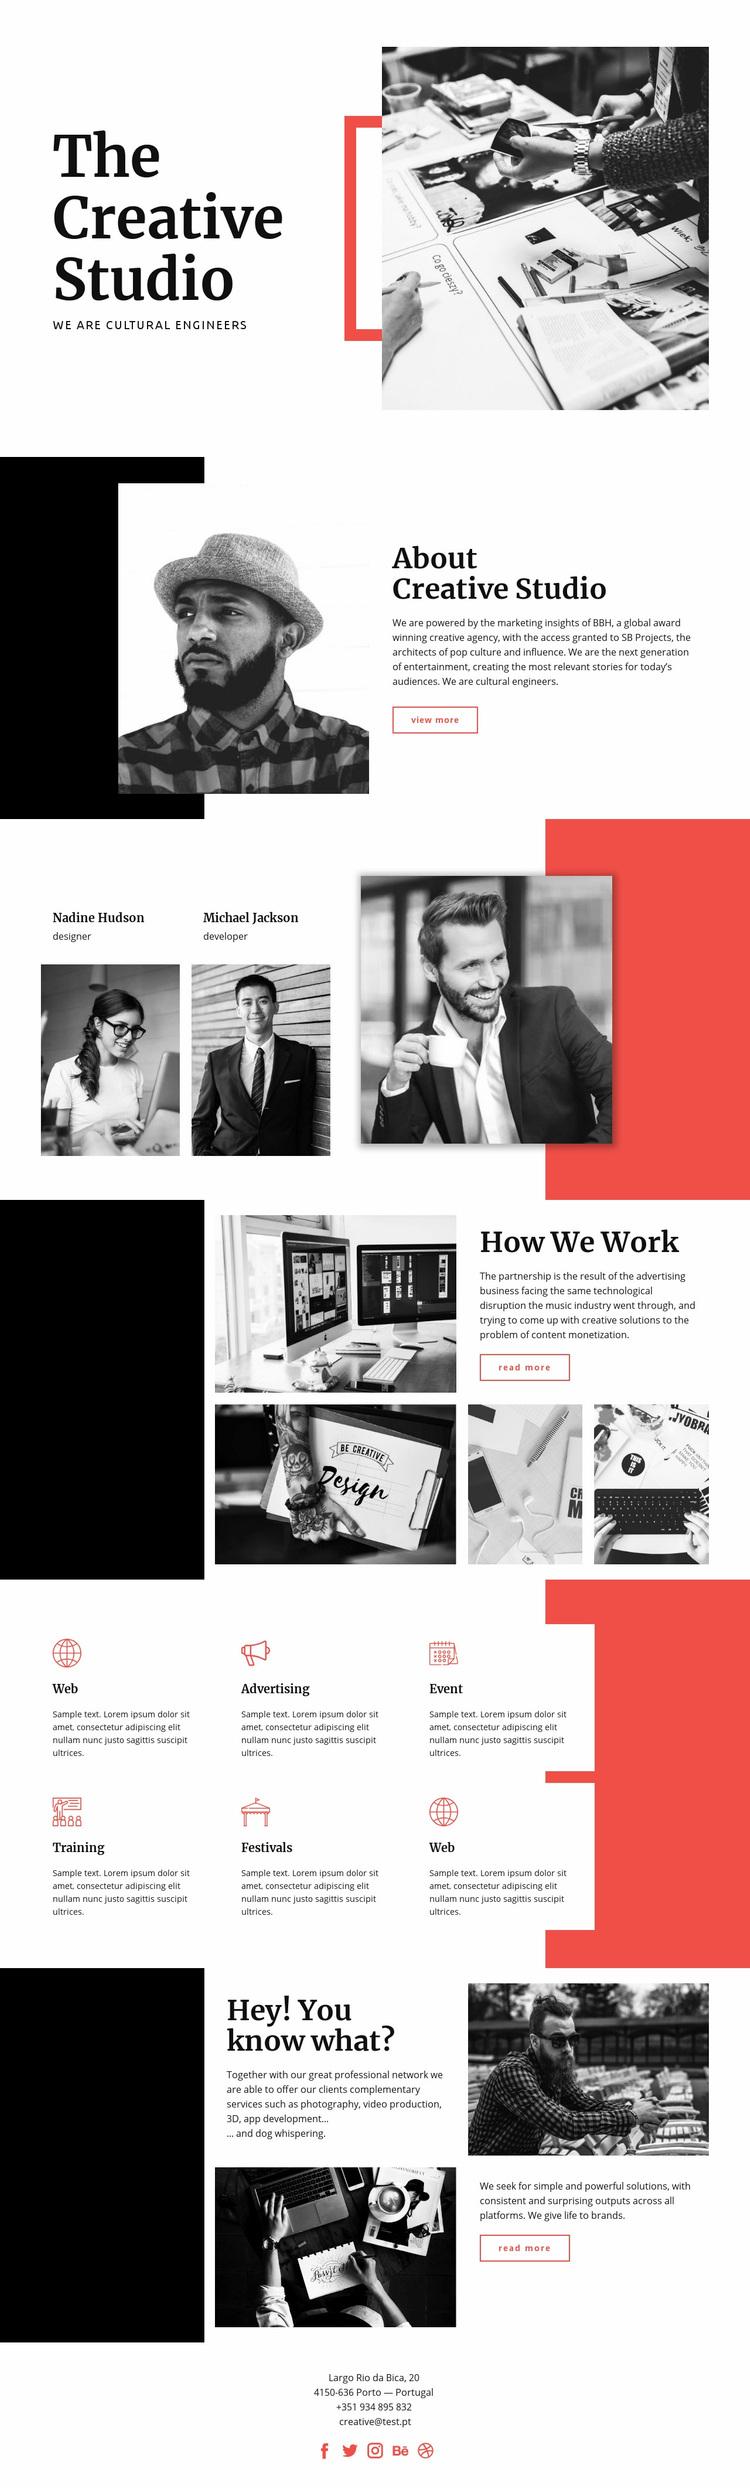 The Creative Studio Web Page Designer